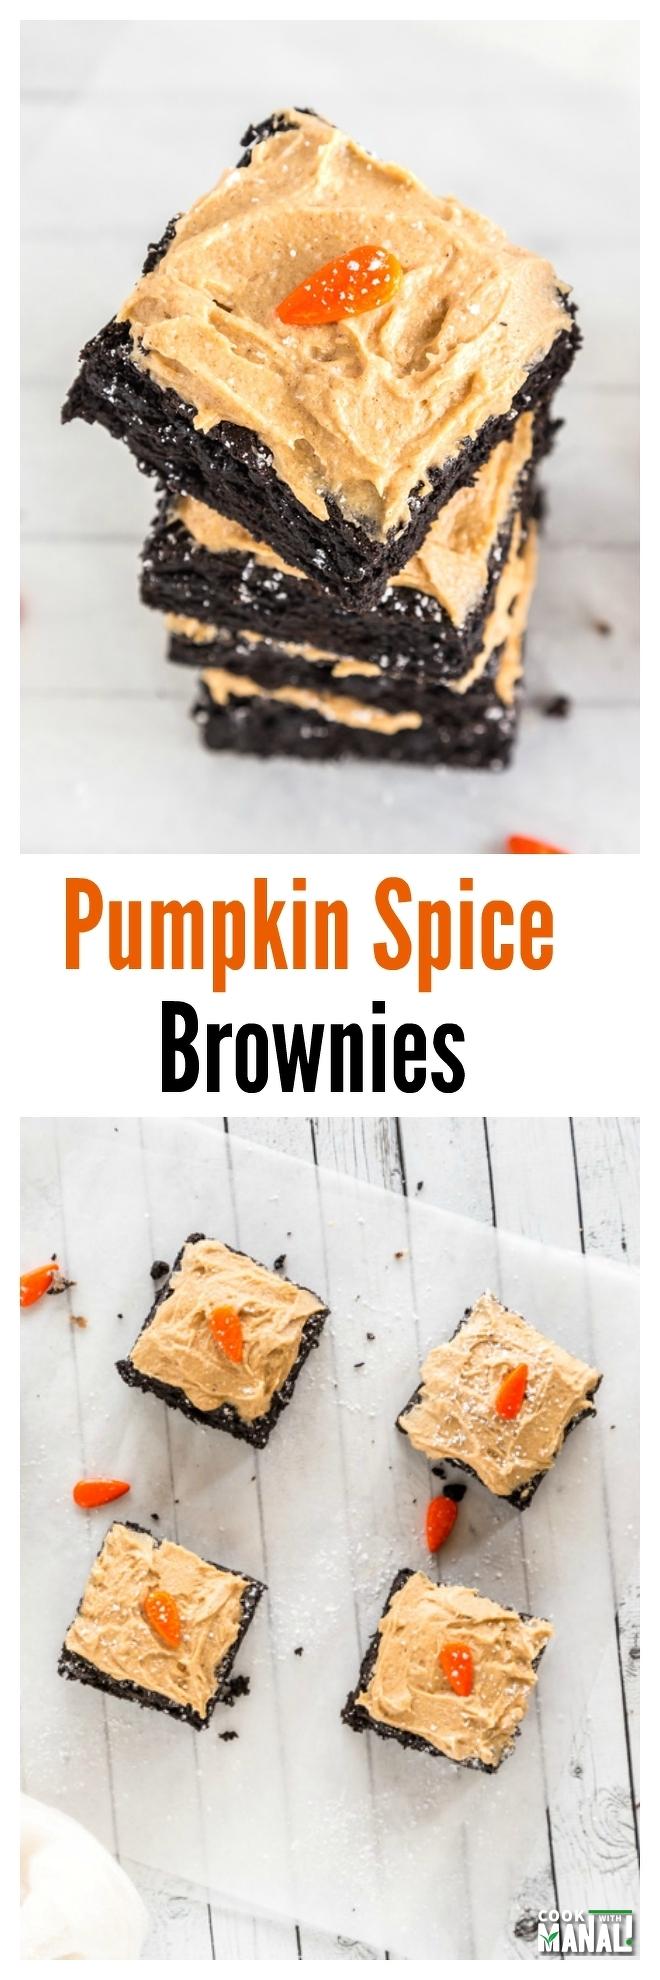 Pumpkin Spice Brownies Collage